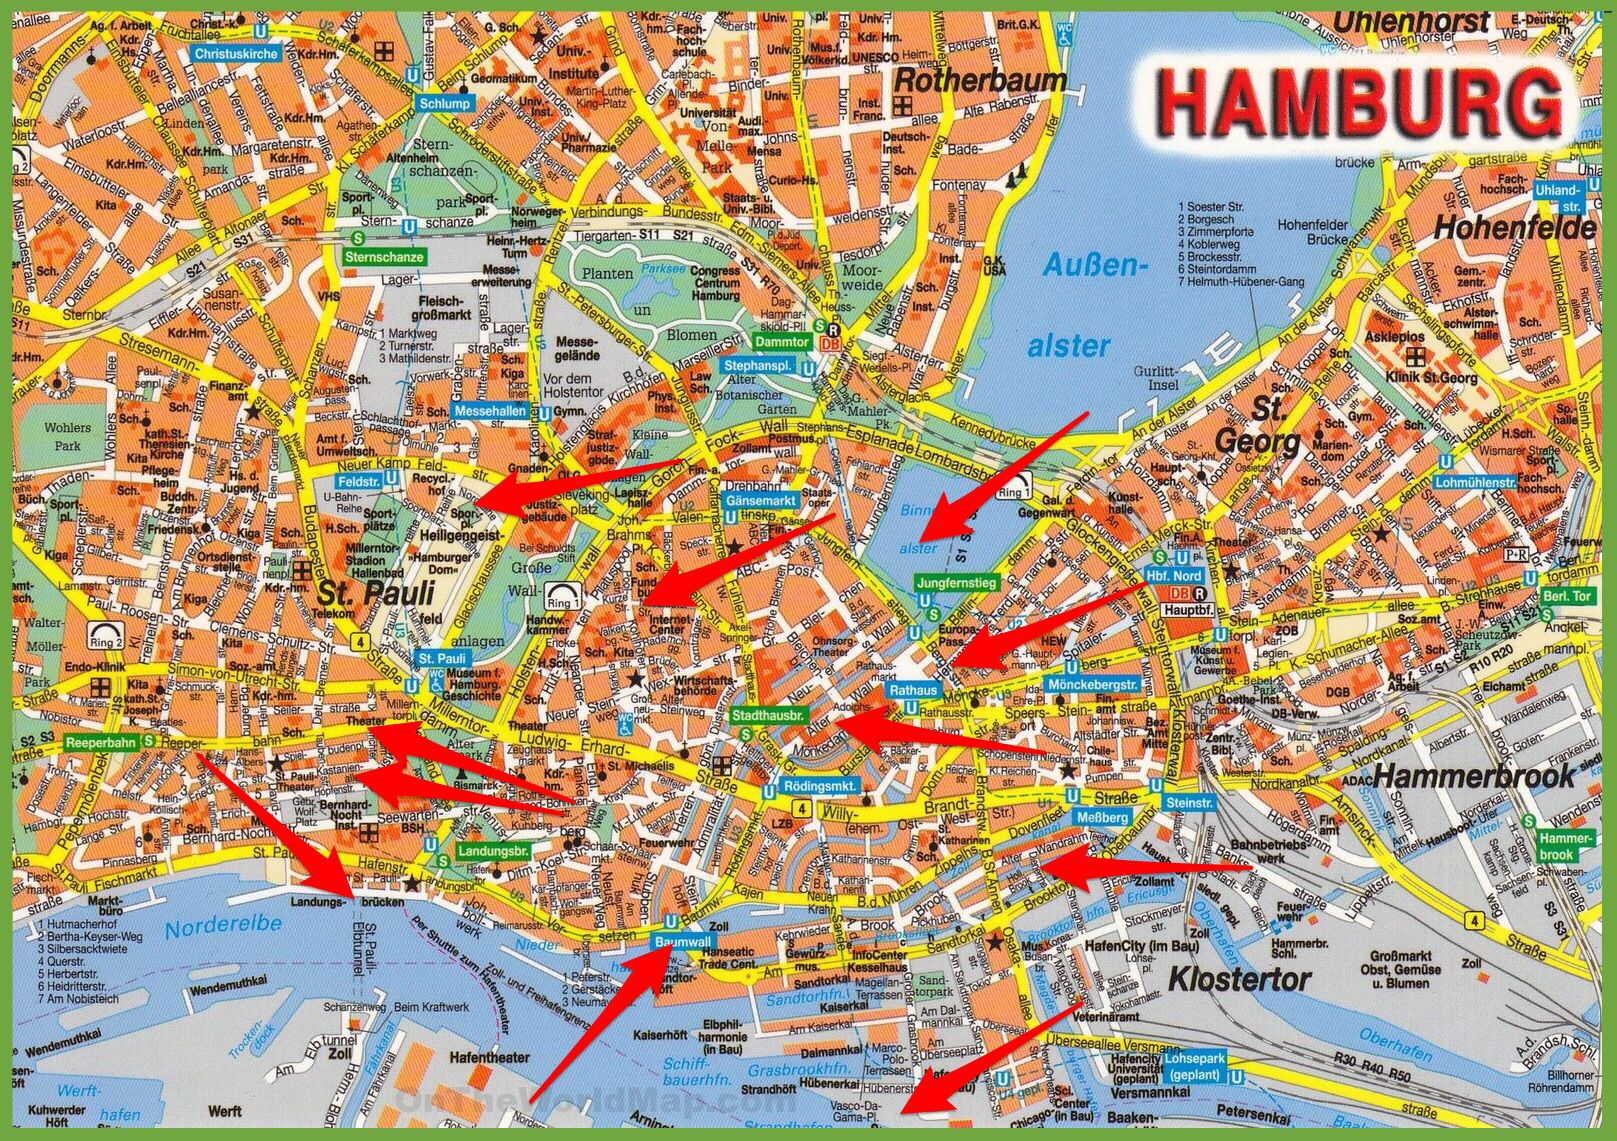 Danska Image By Marko Hamburg Tourist Map Map Germany Map